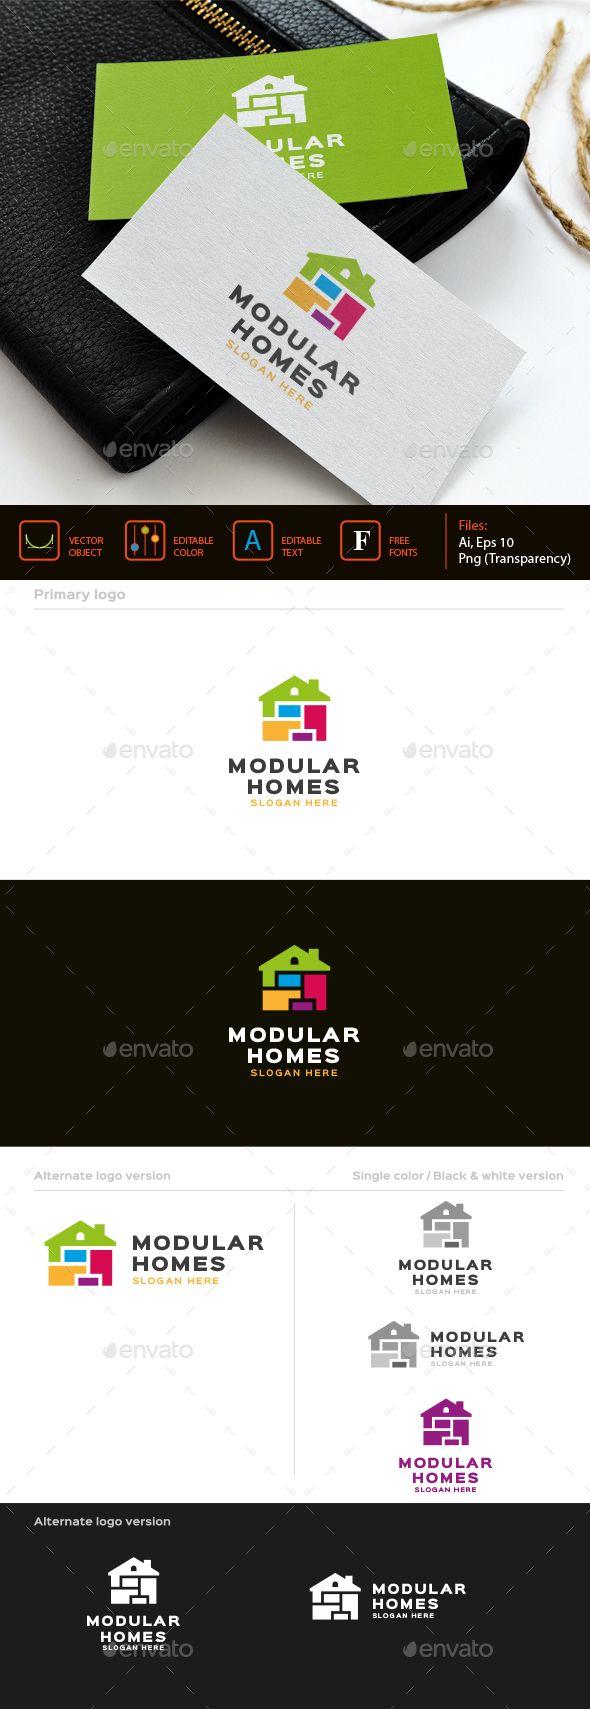 Modular homes Logo v.2 #transparent #png #housing #cleanliness • Available here → https://graphicriver.net/item/modular-homes-logo-v2/16058138?ref=pxcr